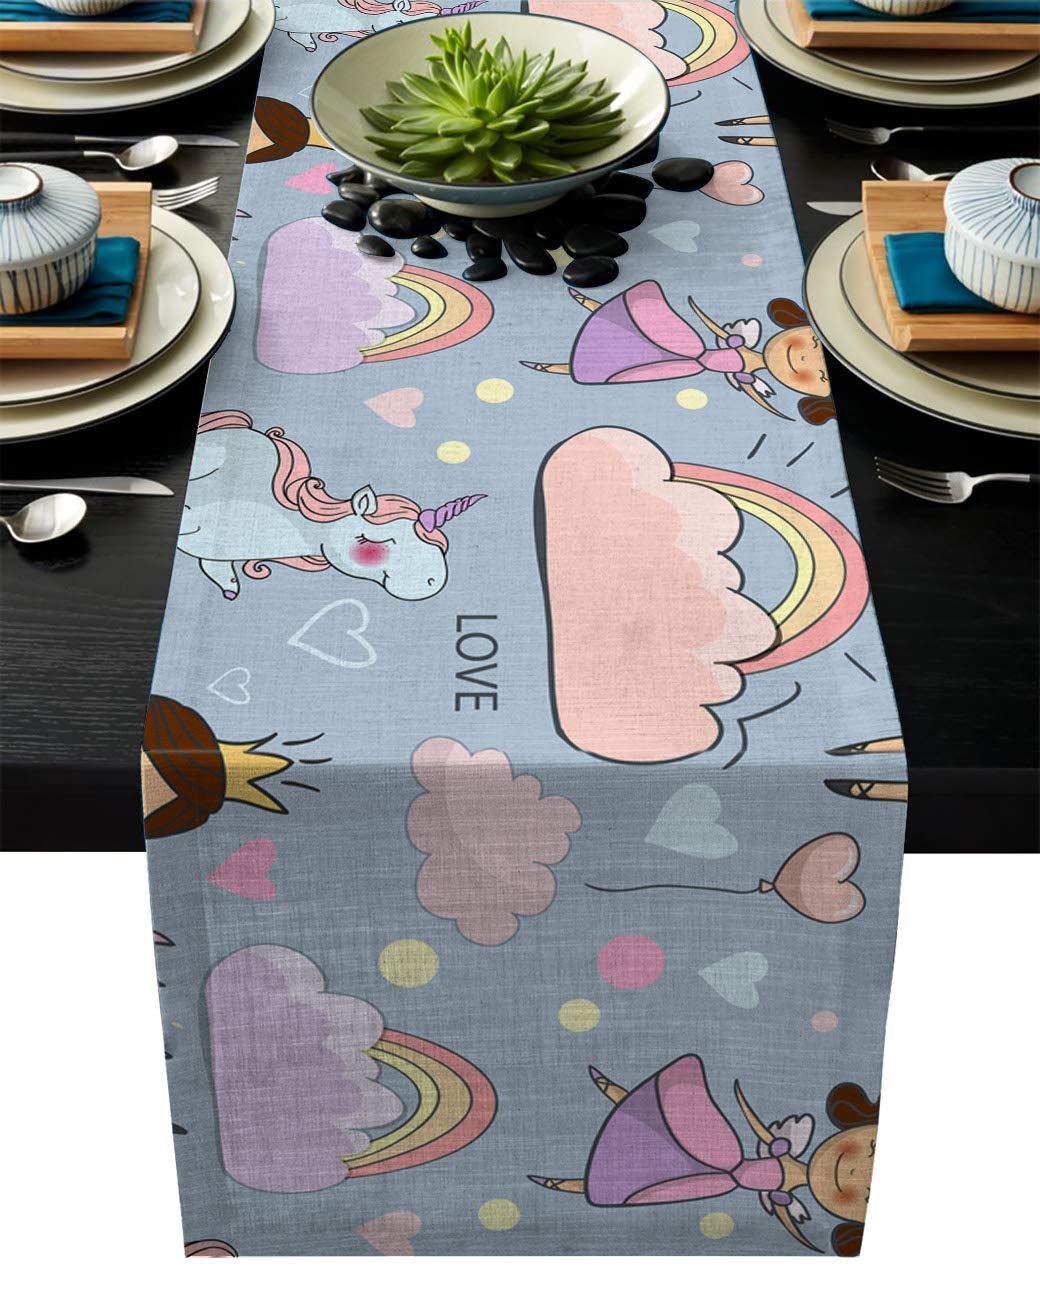 IDOWMAT Linen Burlap Table Runner Dresser Scarves 14 x 72 Inch, Cute Fairy Princess Unicorn Kitchen Table Runners for Farmhouse Dinner, Holiday Parties, Wedding, Events, Decor